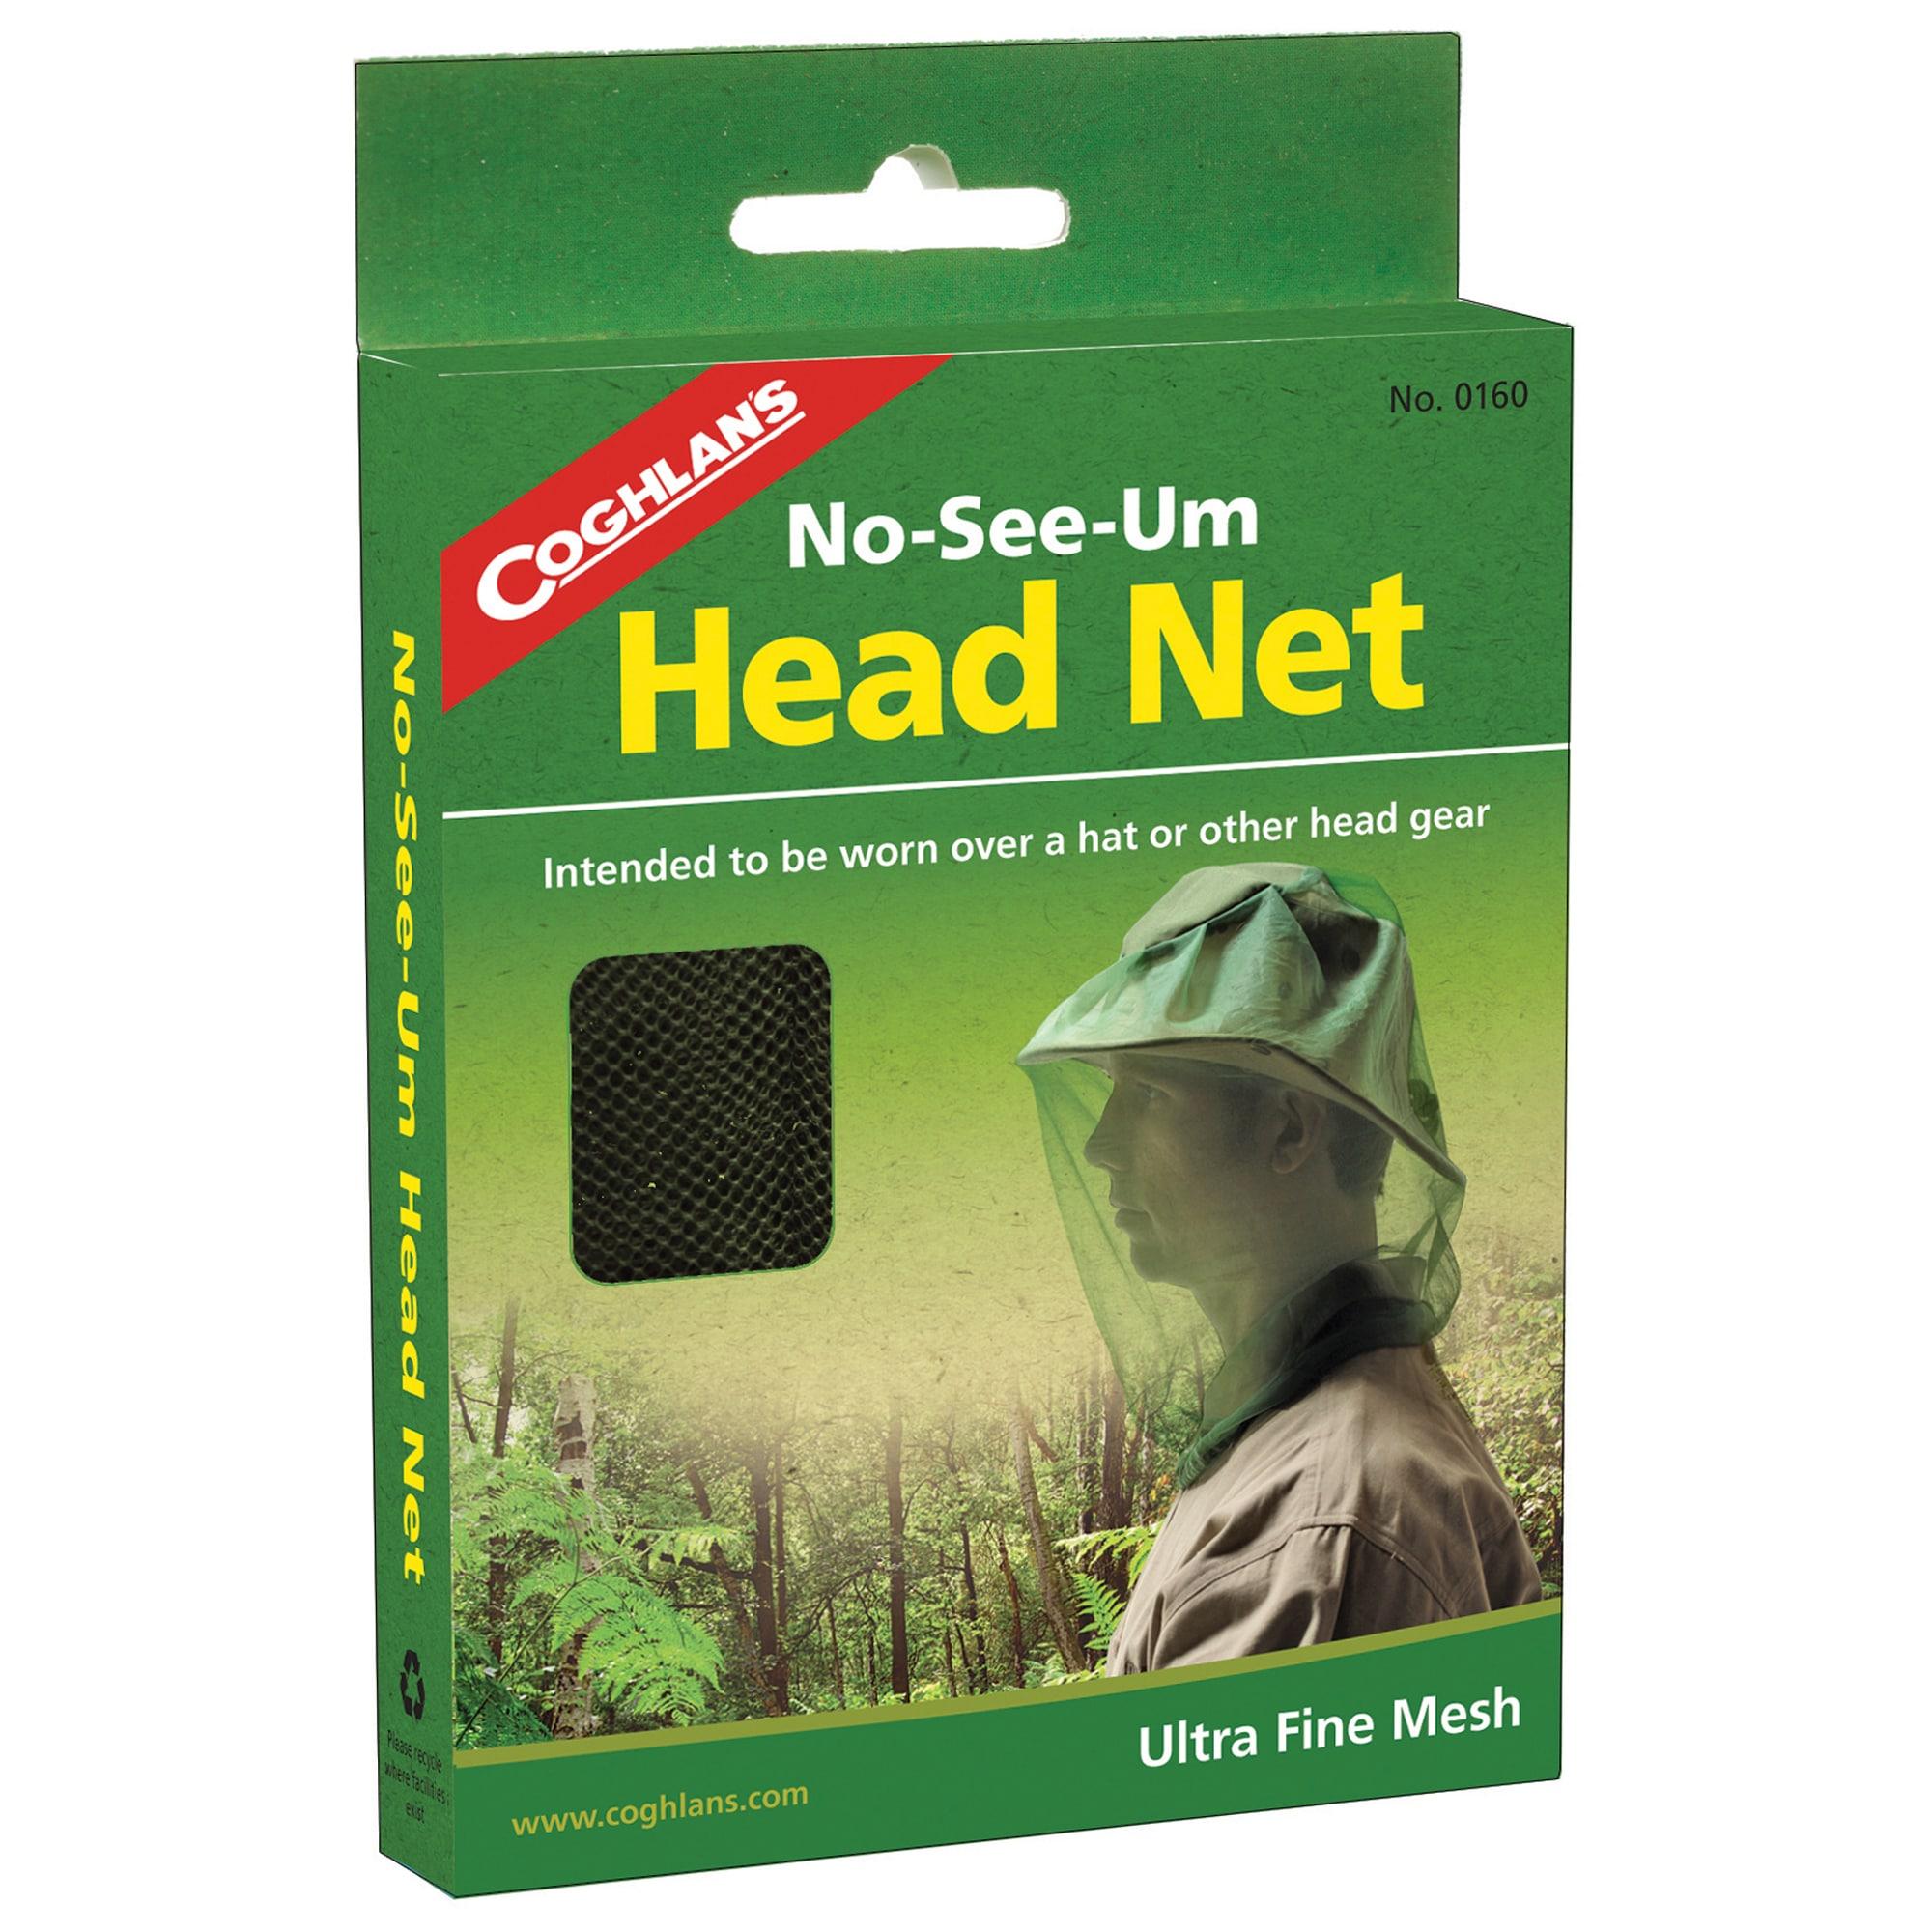 Coghlans Head Net No-see-um (mesh)